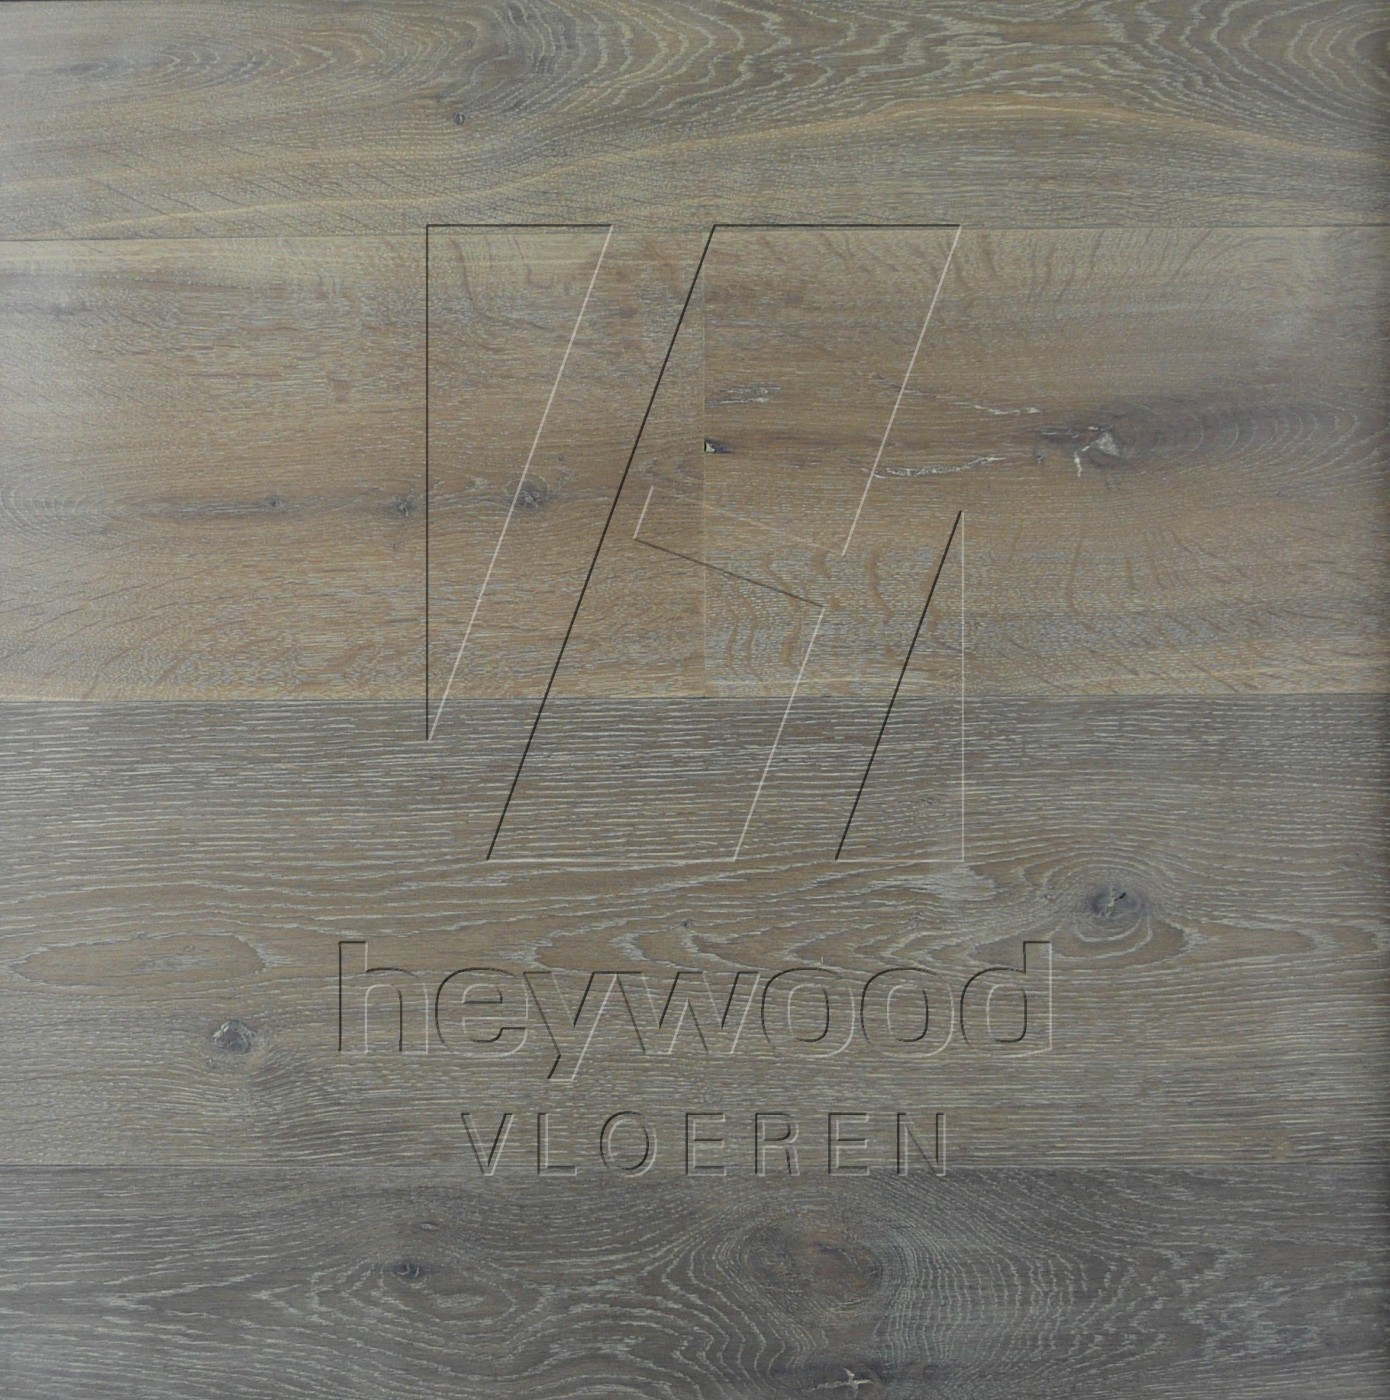 Montreal heywood vloeren for Hardwood floors montreal